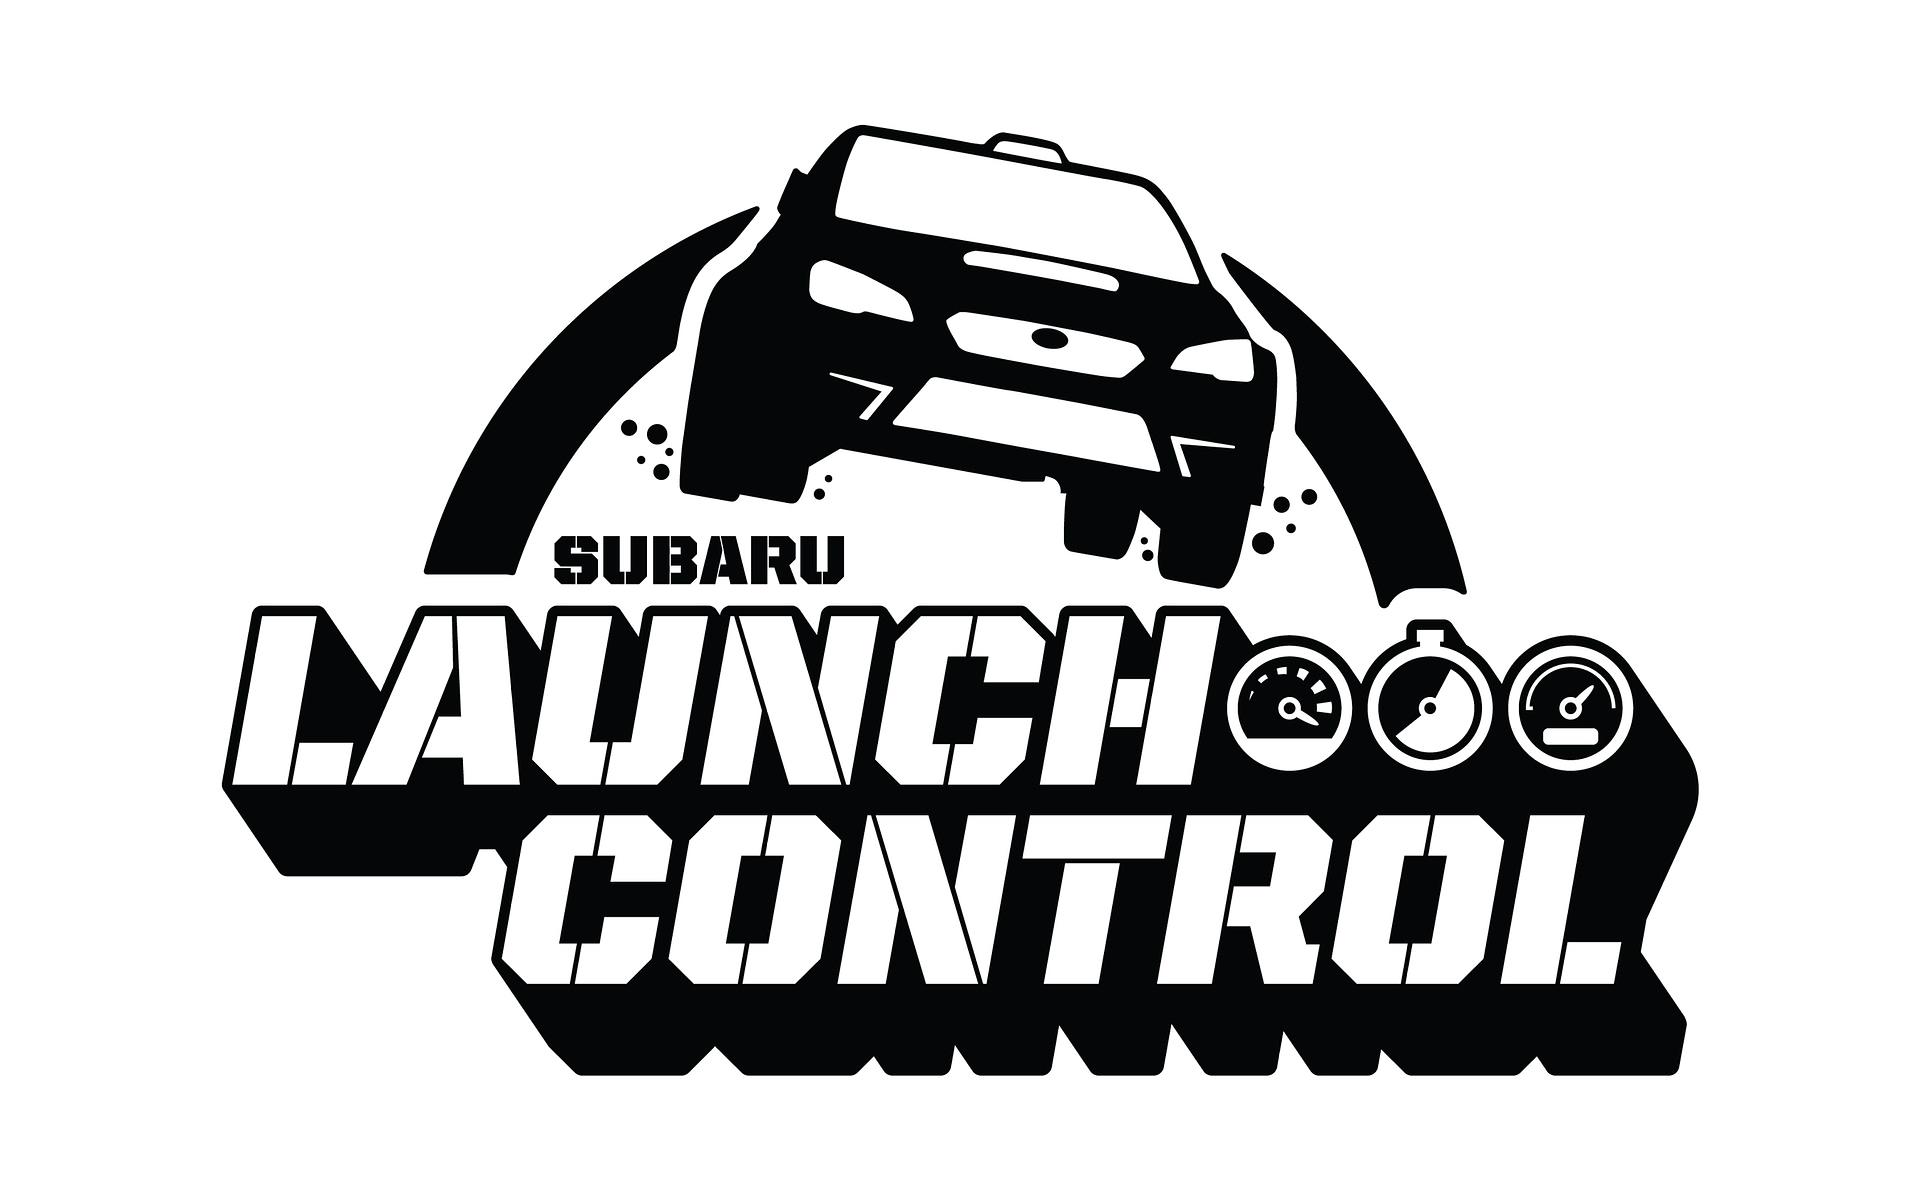 Launch Control Logo